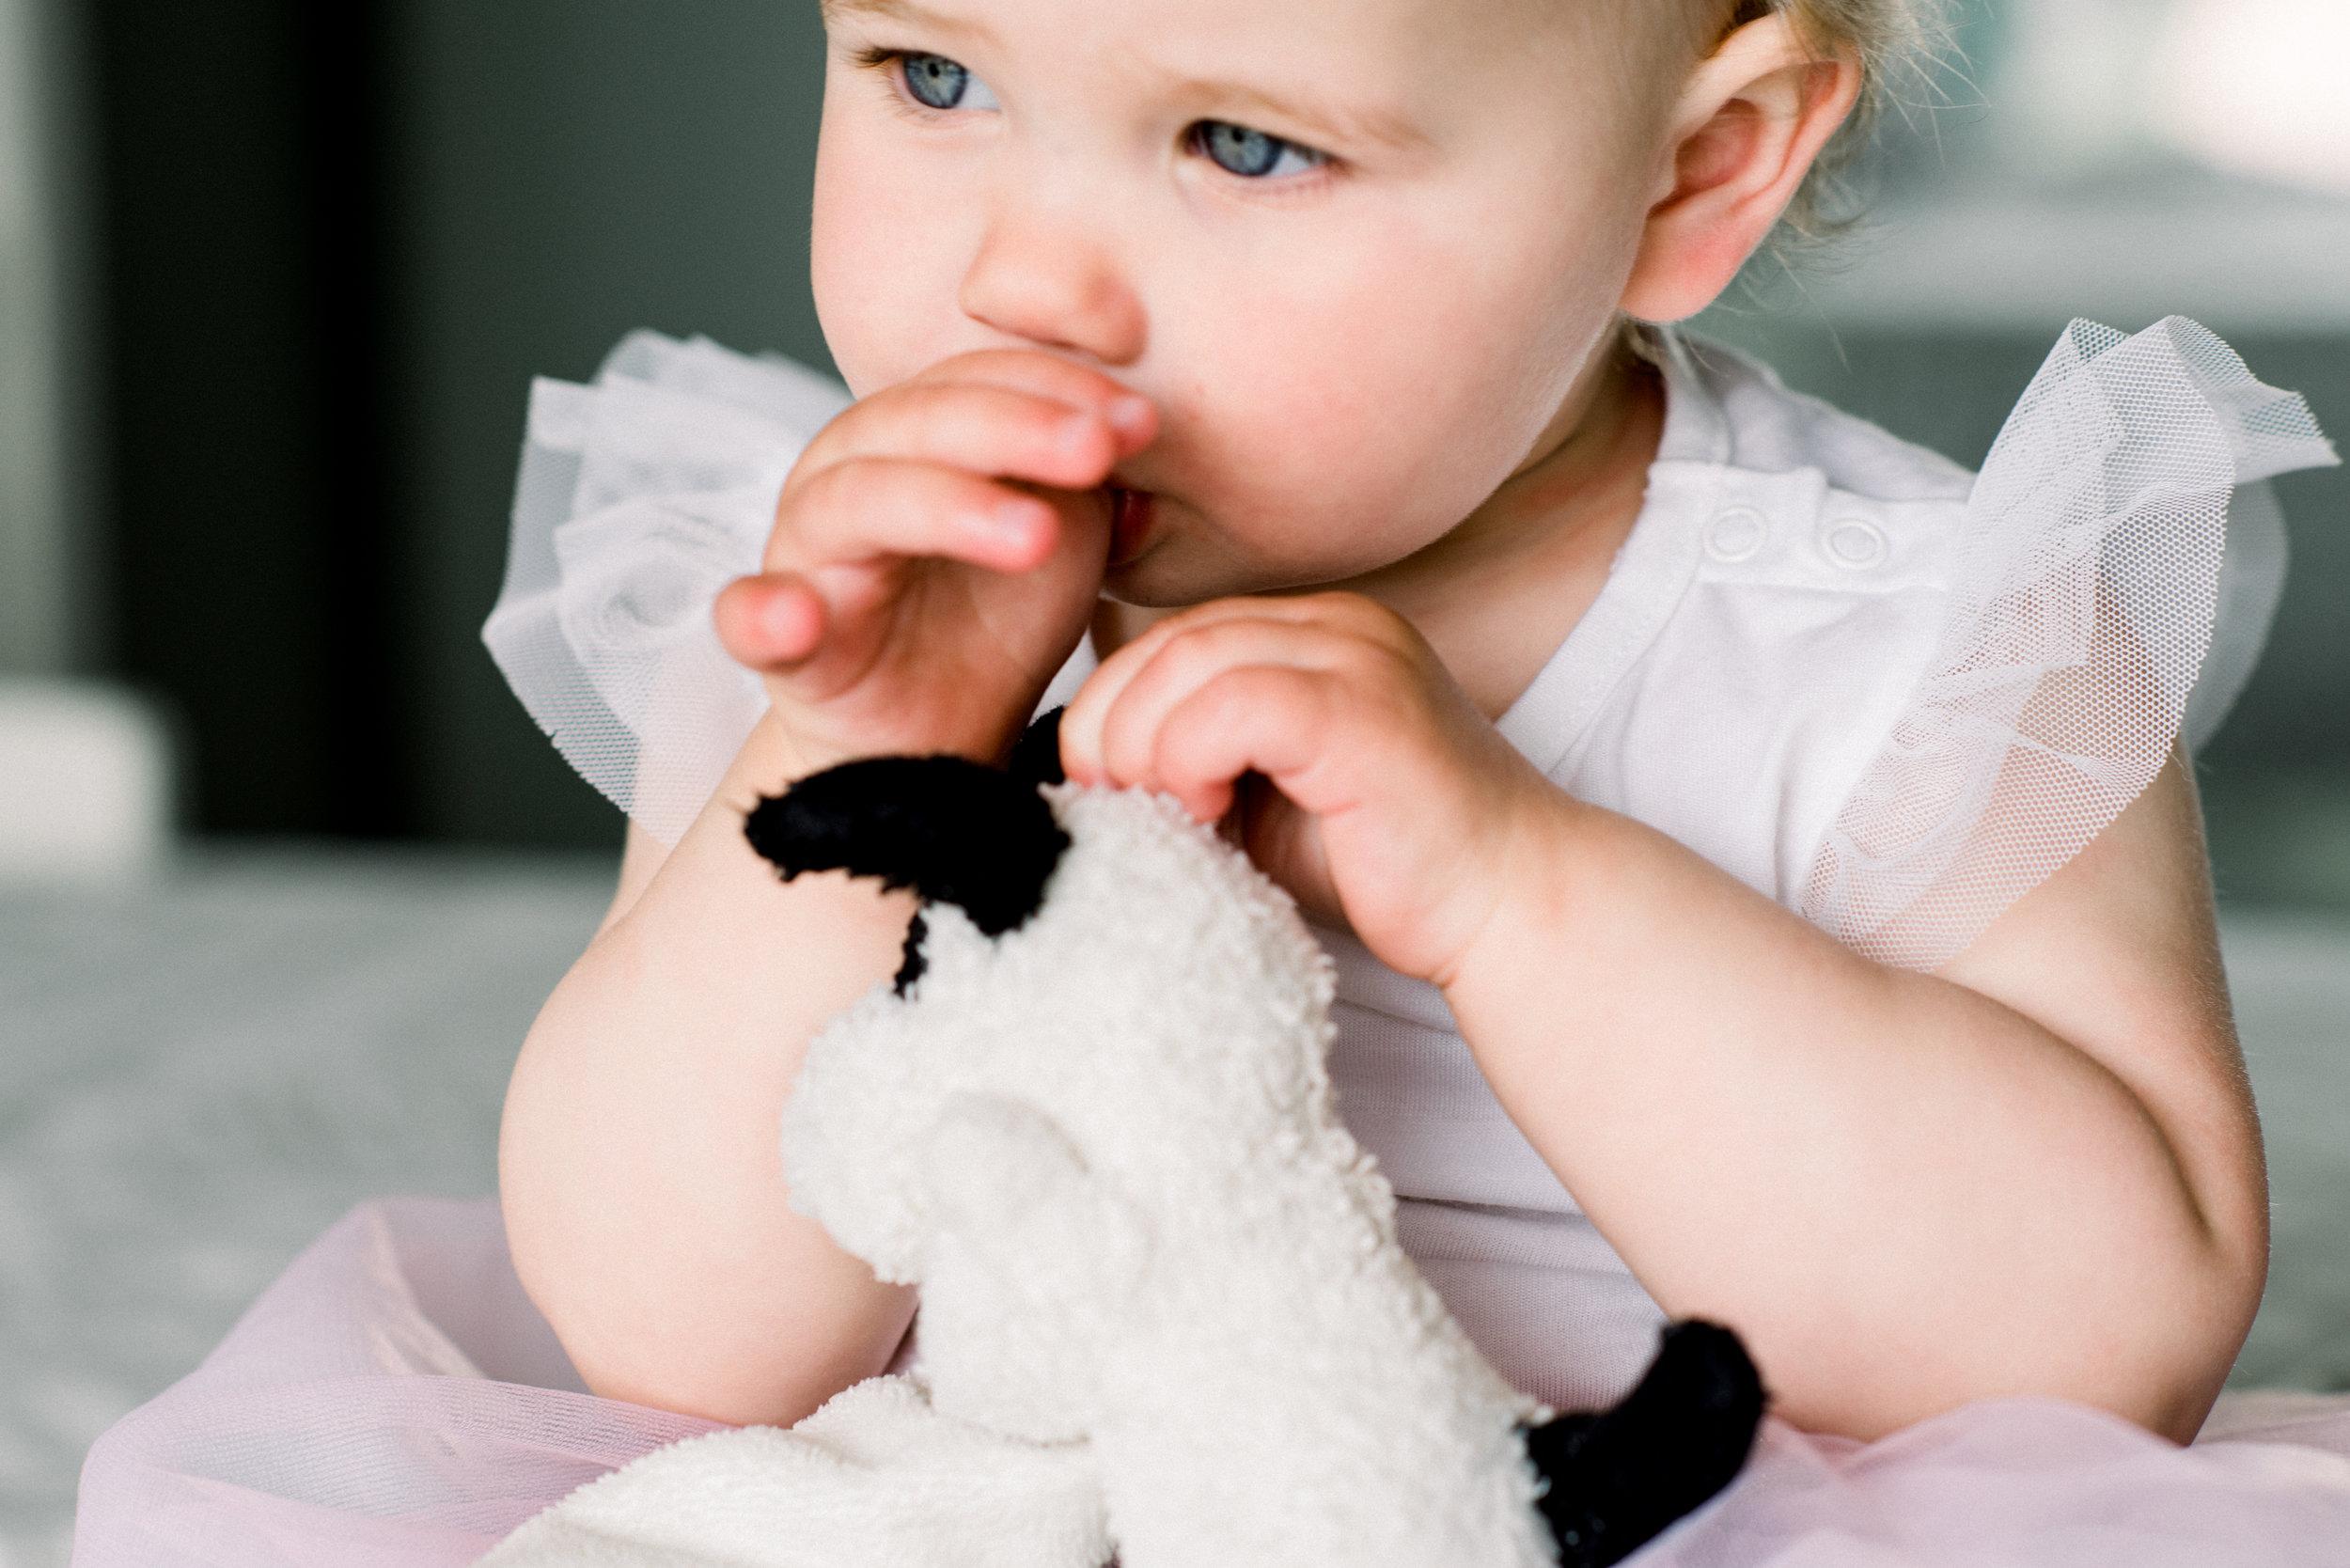 laur_newborn-51.jpg